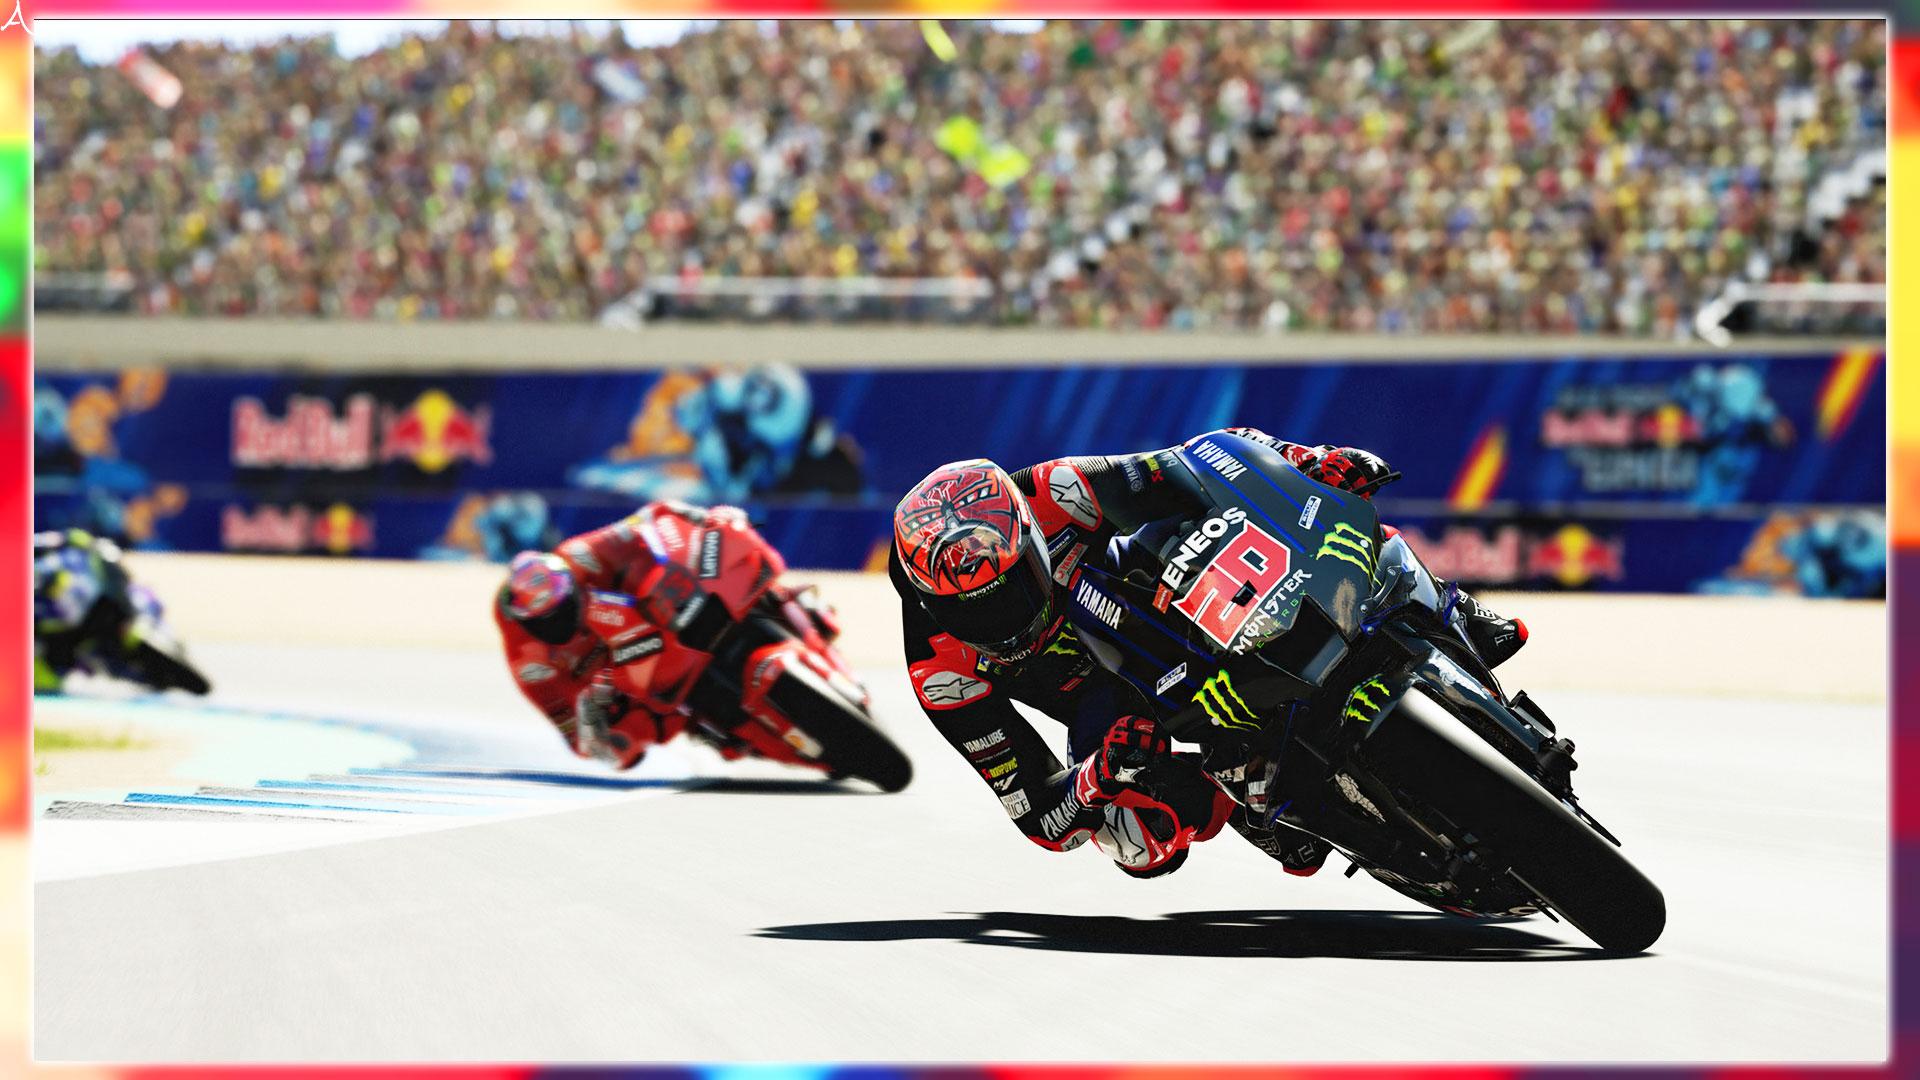 PC版「MotoGP 21」に必要な最低/推奨スペックを確認